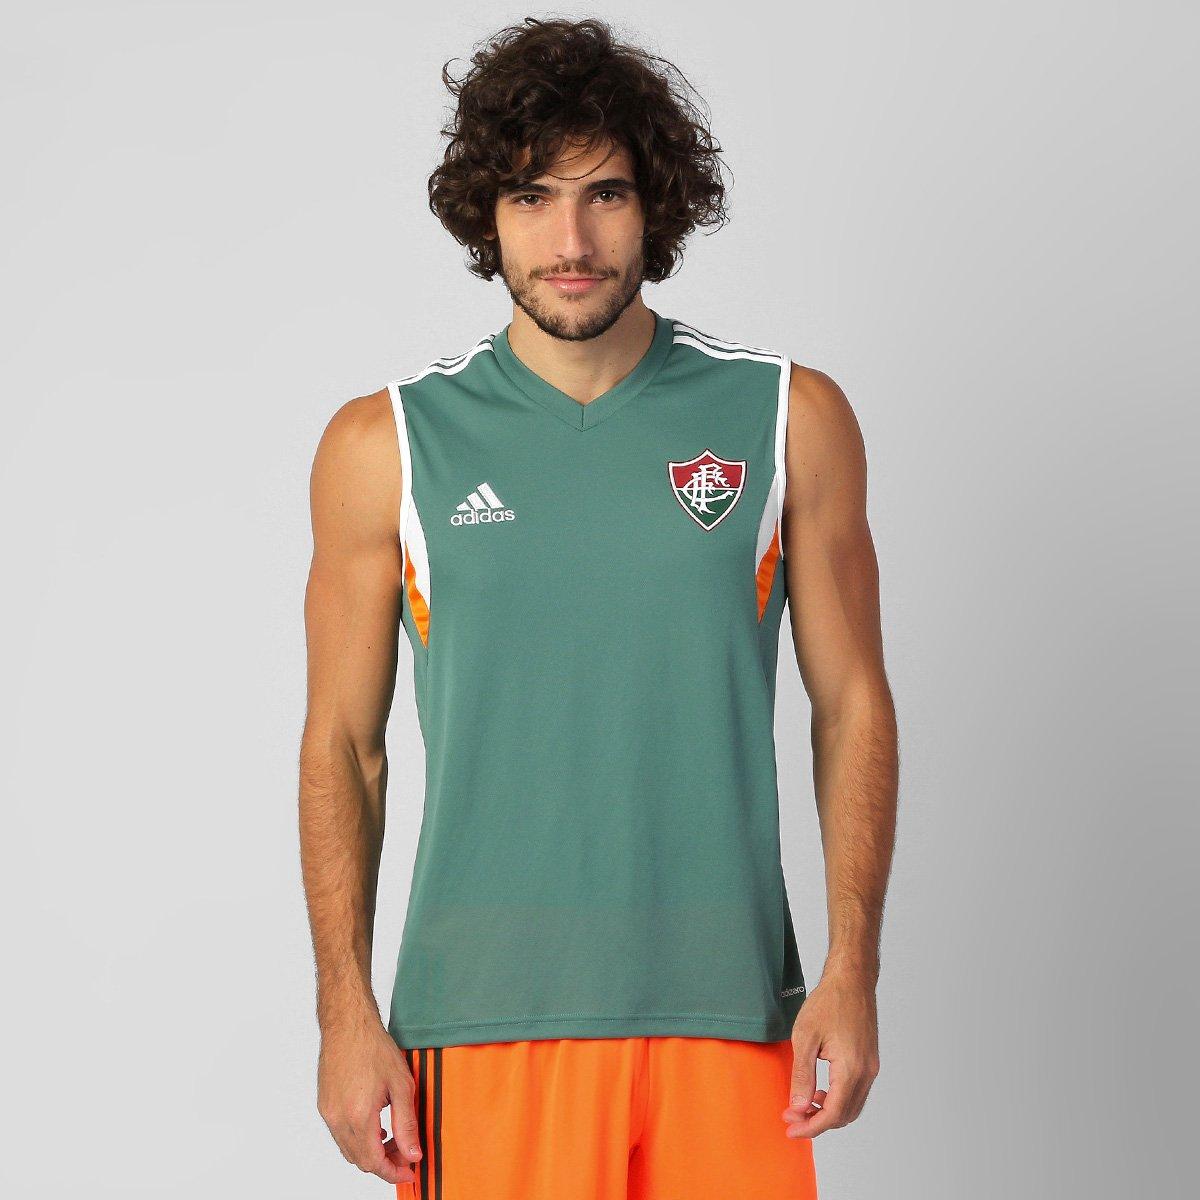 97d38f8729 Camiseta Regata Adidas Fluminense Treino 2014 - Compre Agora